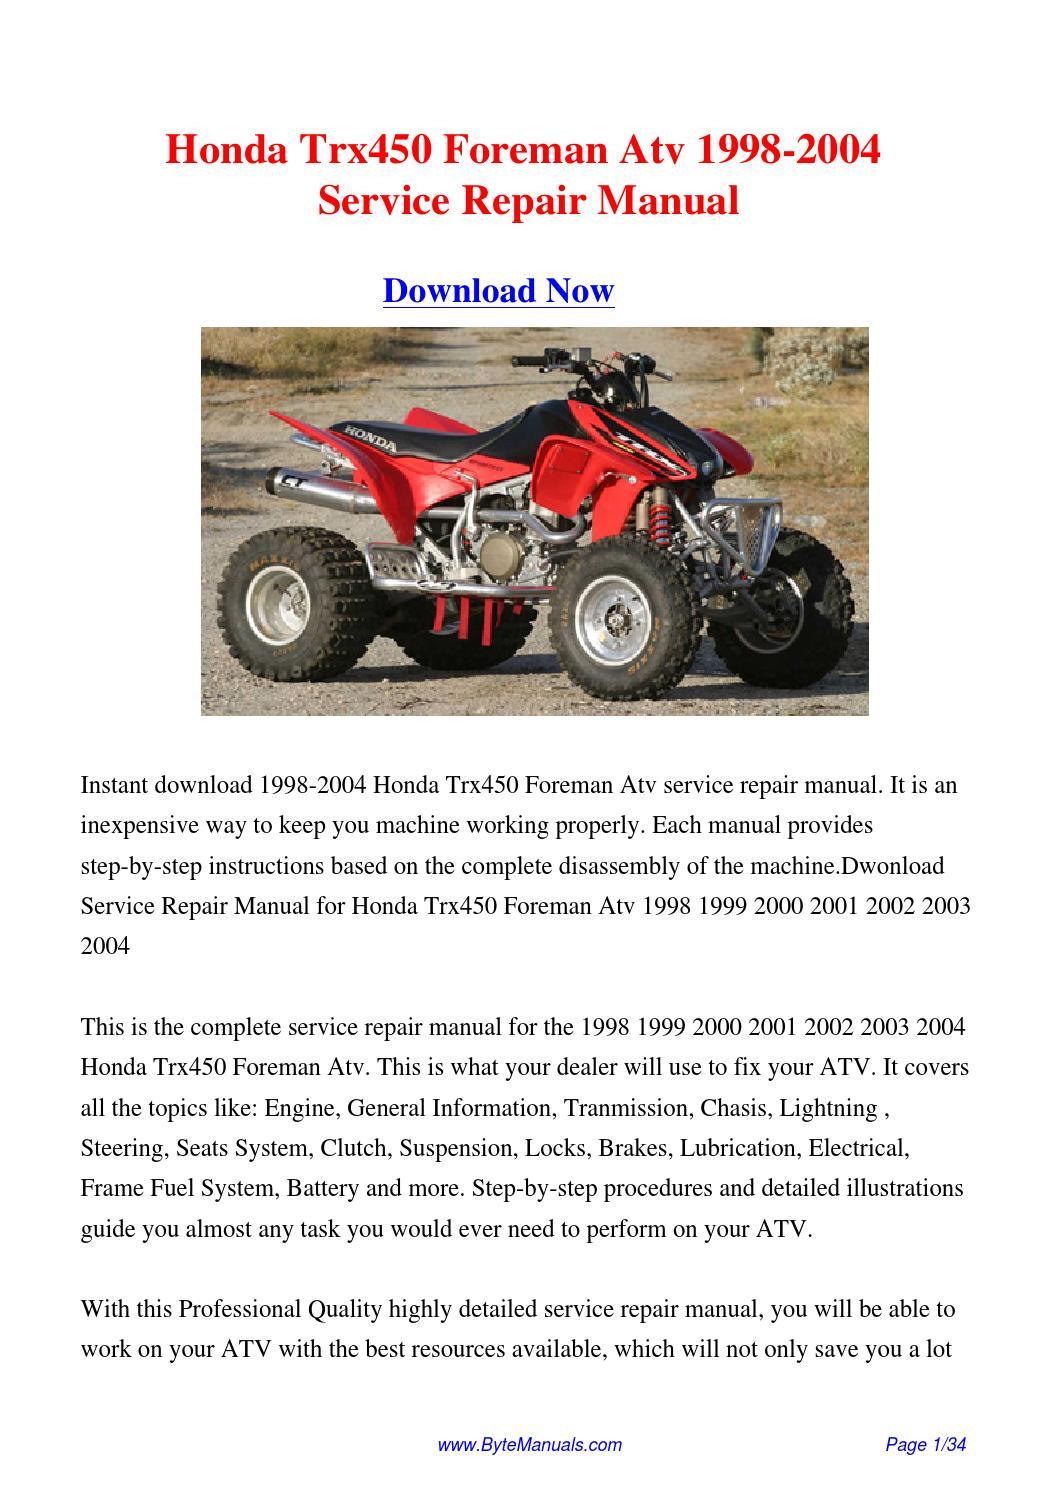 2003 2004 2005 honda trx650 rincon atv service manual.